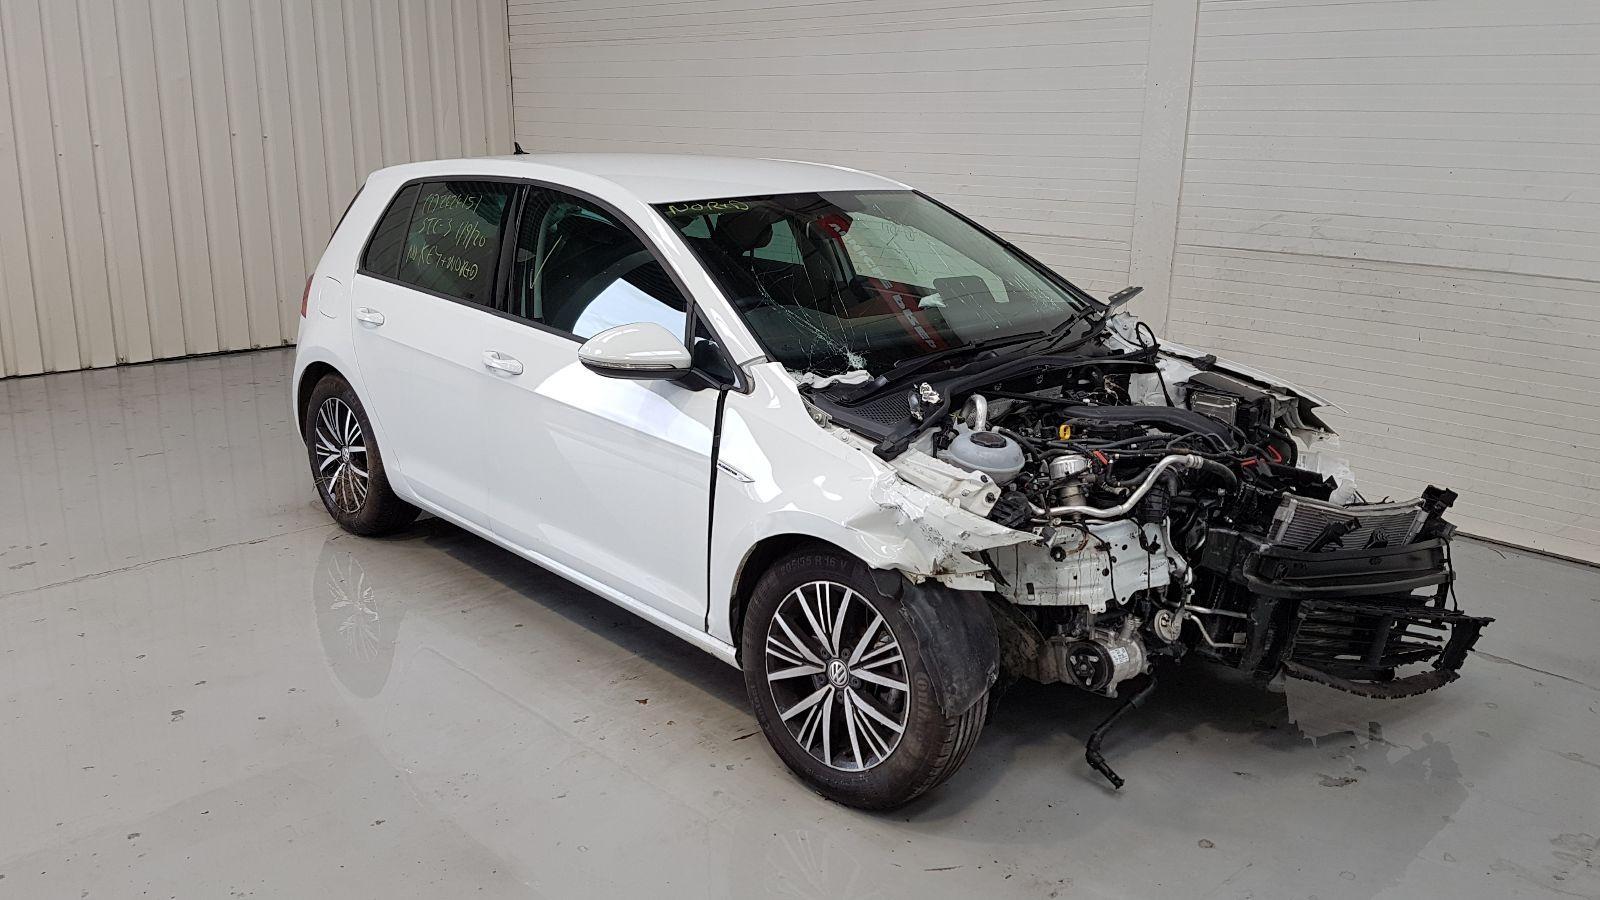 Image for a 2019 Volkswagen Golf 1.5 Petrol DACA Engine